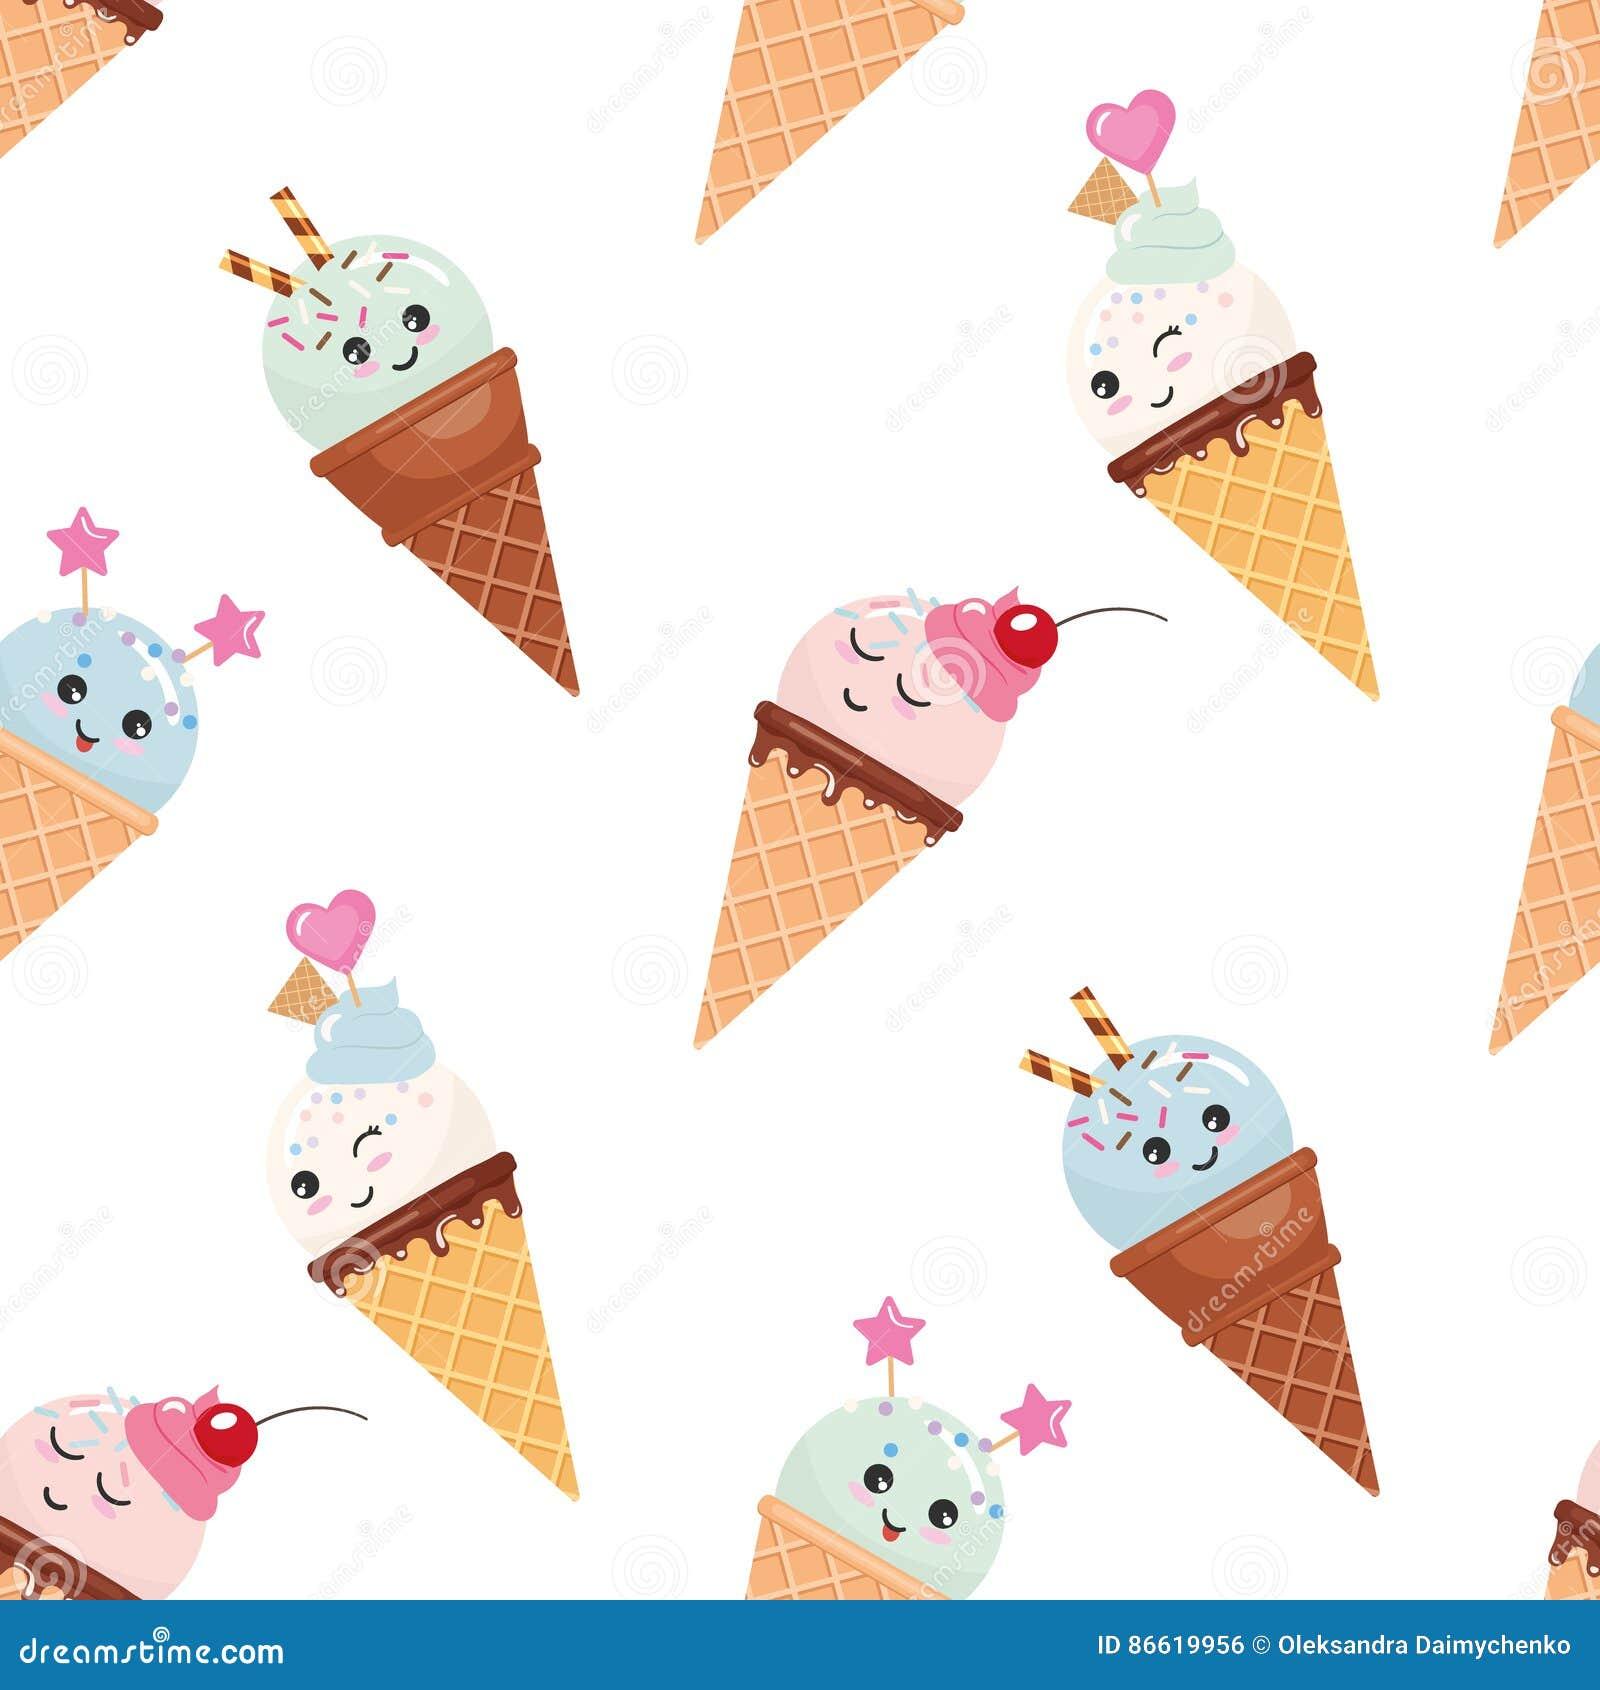 Ice Cream Cones Seamless Pattern Background Stock Vector: Kawaii Ice Cream Cone Seamless Pattern Background. Pastel